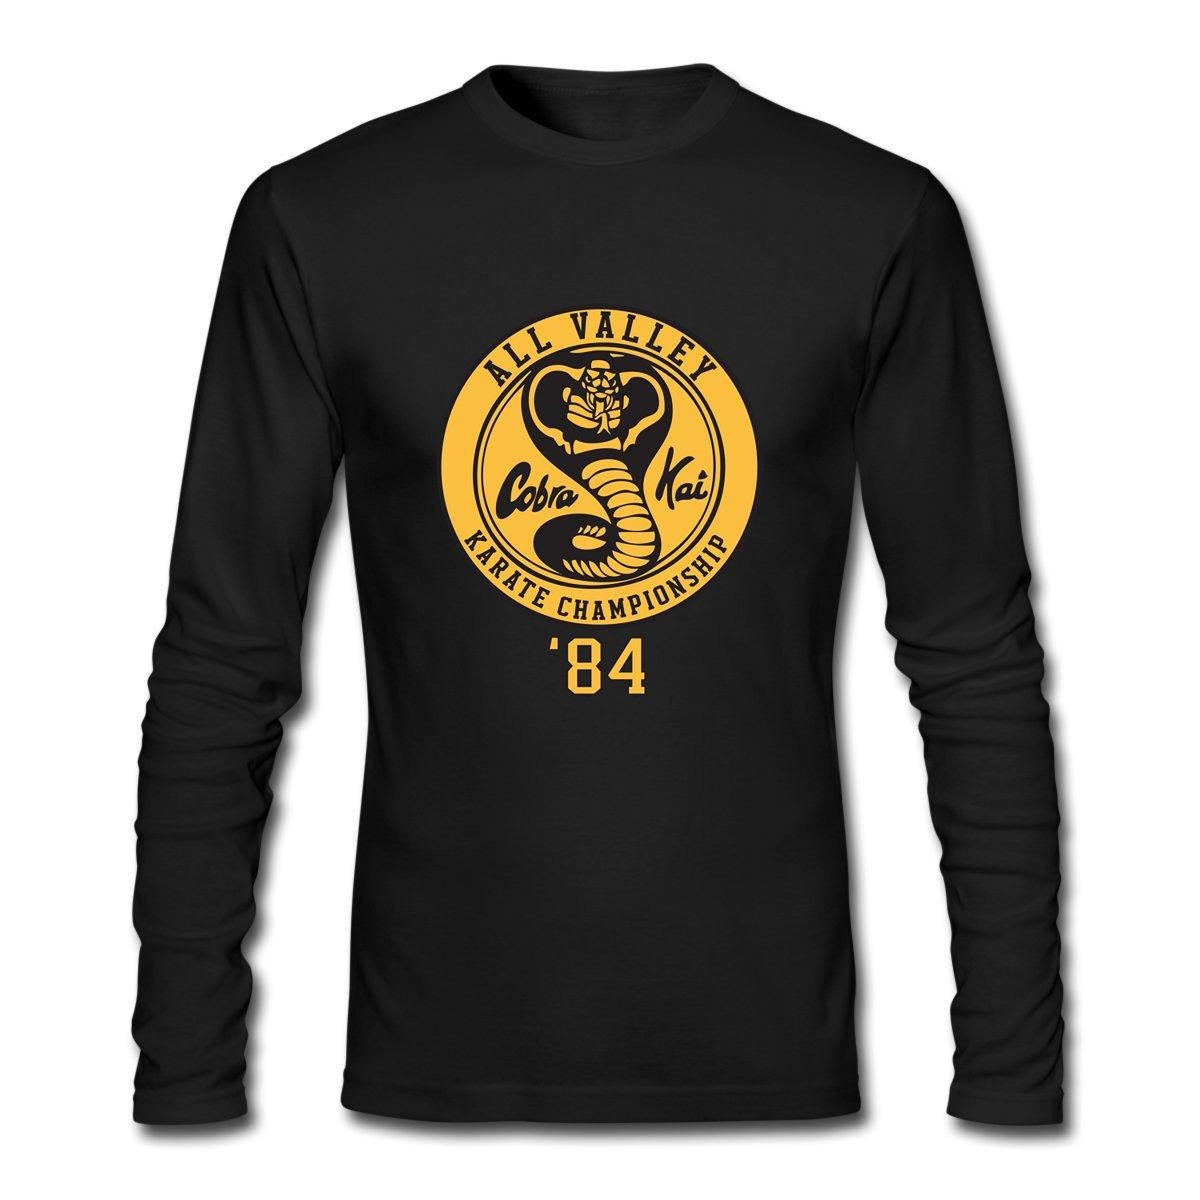 Hillet S Cobra Kai S Graphic Shirts